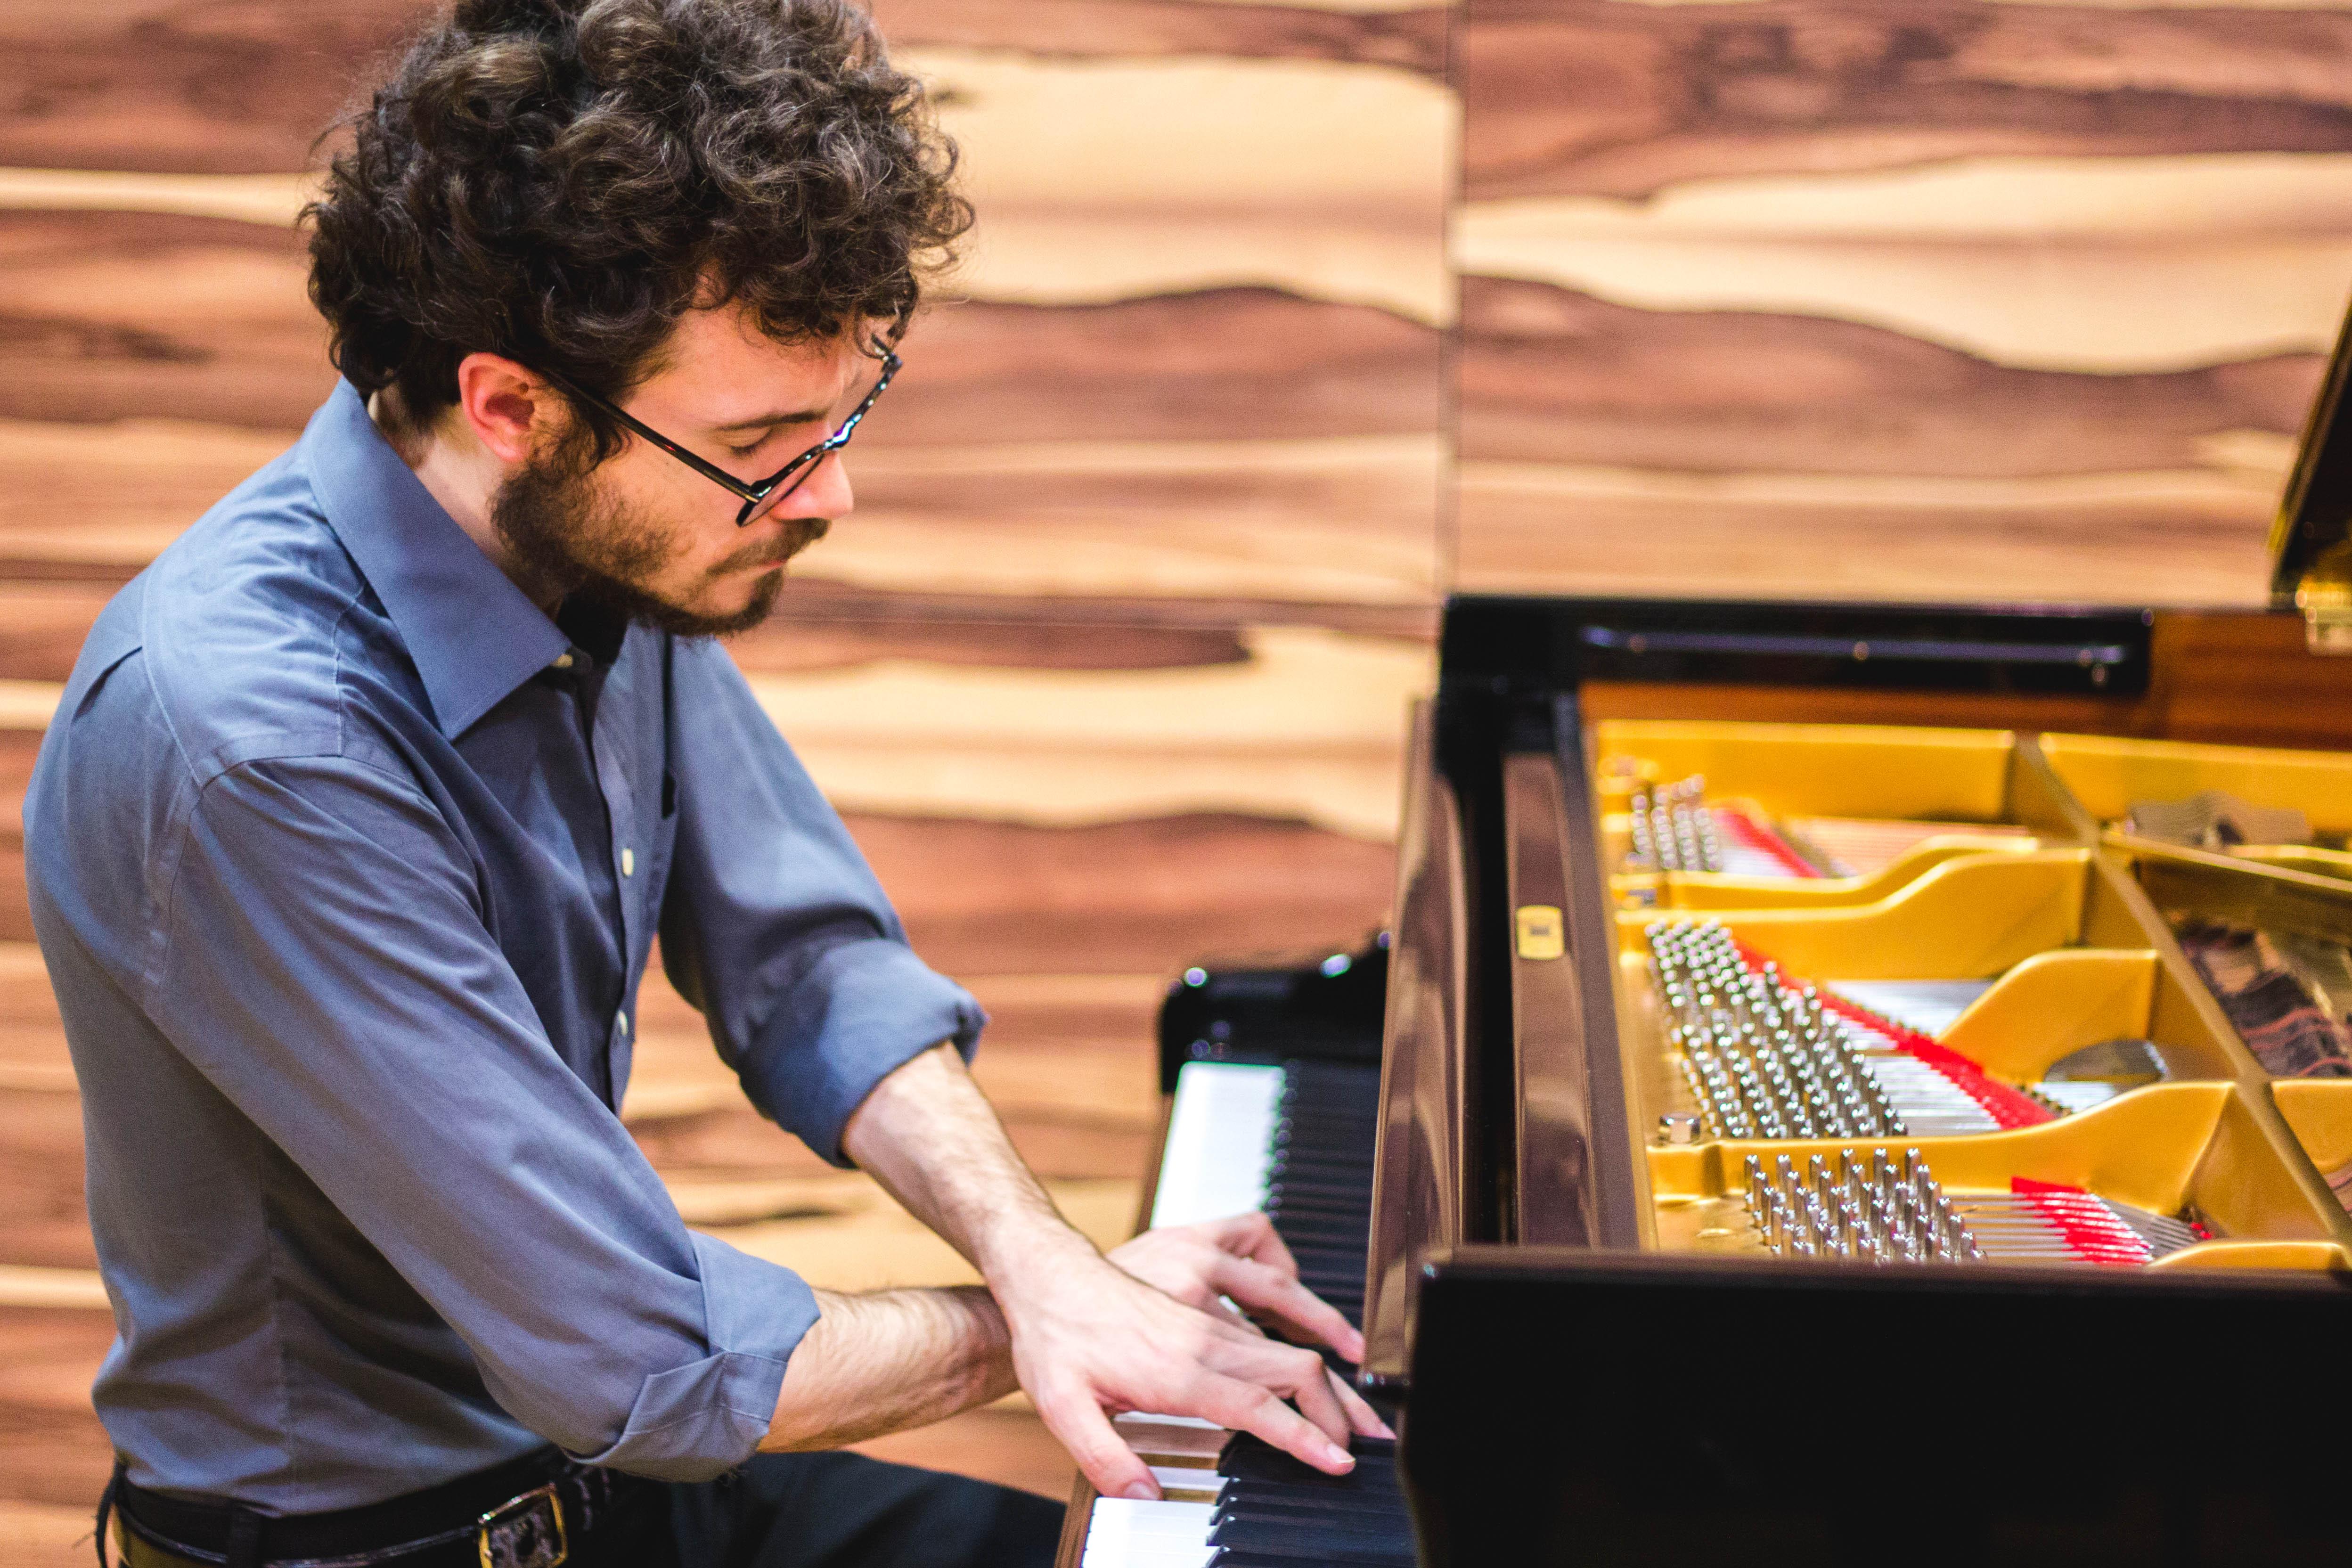 Joshua Rupley crossed hands piano playing klavier